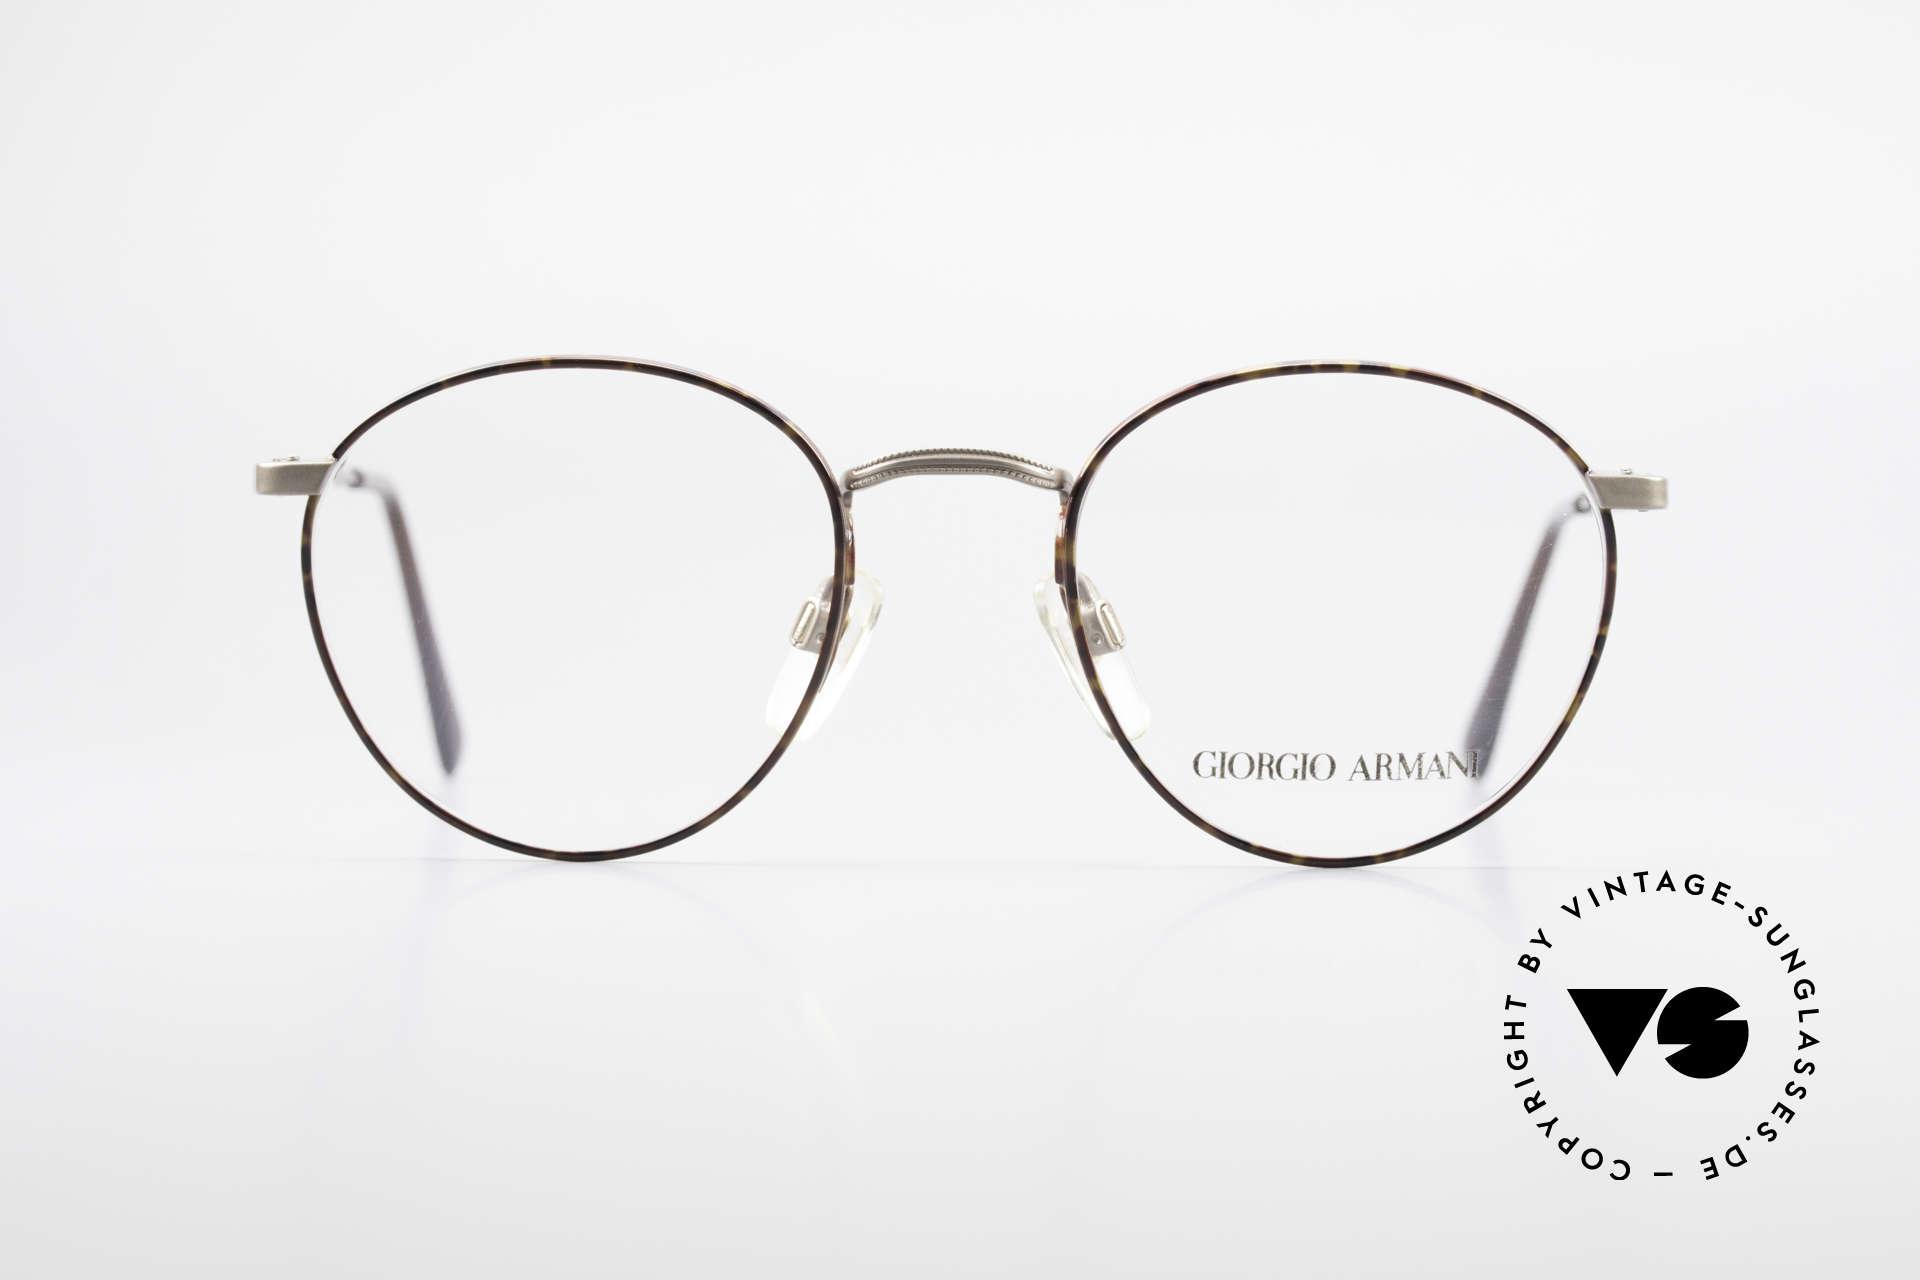 Giorgio Armani 166 No Retro Glasses 80's Panto, a timeless 1980's model in tangible premium quality, Made for Men